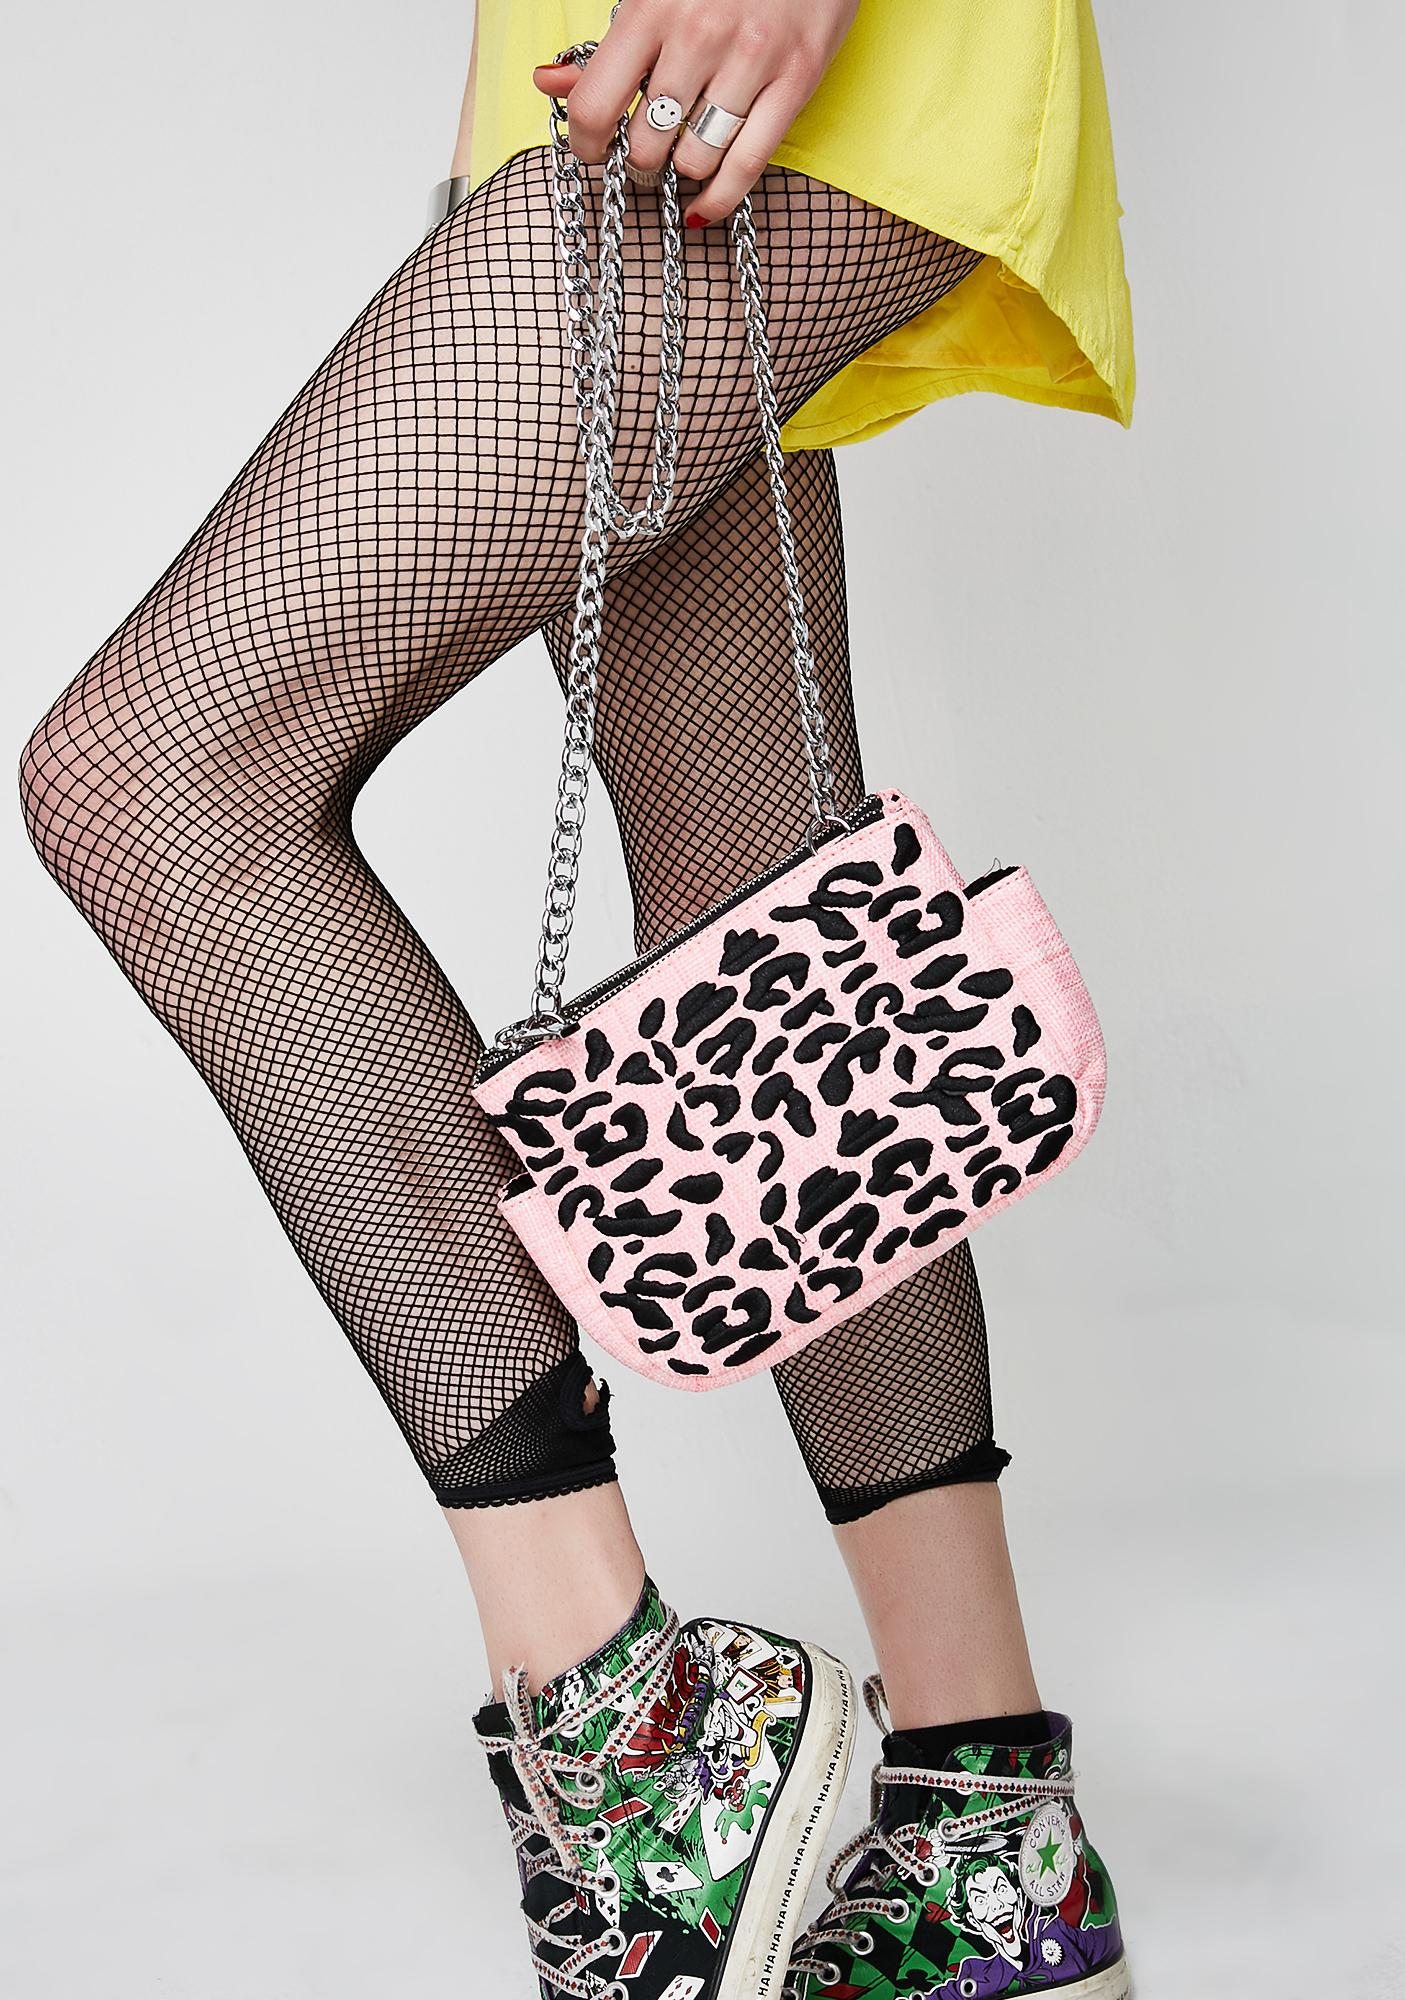 Skinnydip Leopard Picnic Crossbody Bag   Dolls Kill d8c5ff0e78